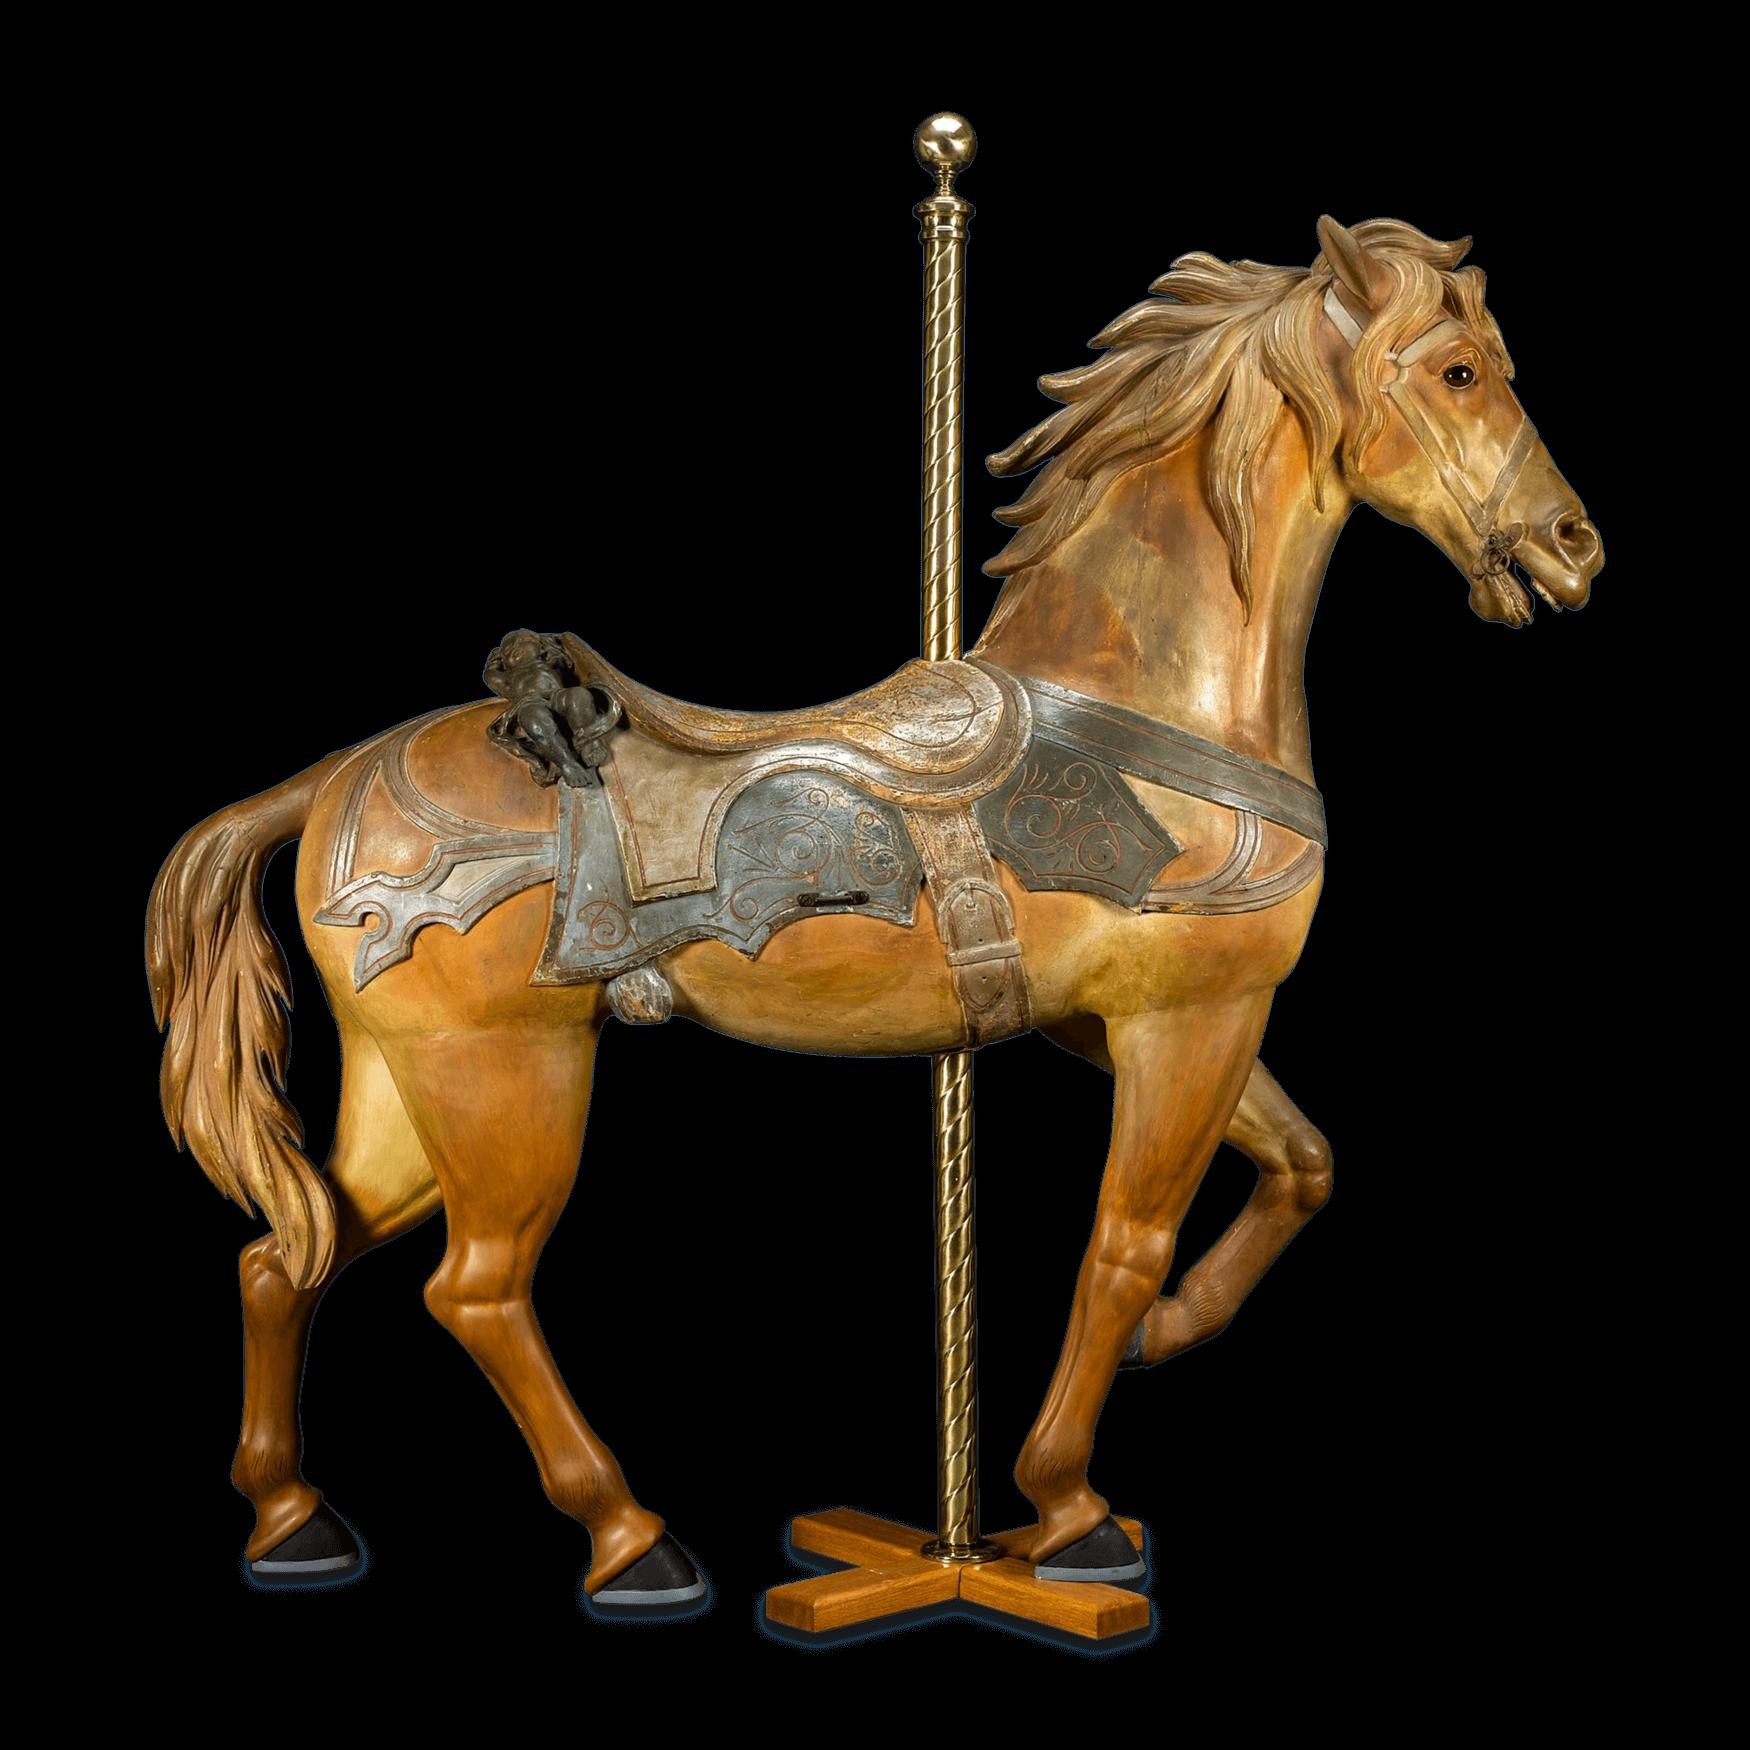 Philadelphia Toboggan Company Carousel Horse - Carousel Horse PNG HD